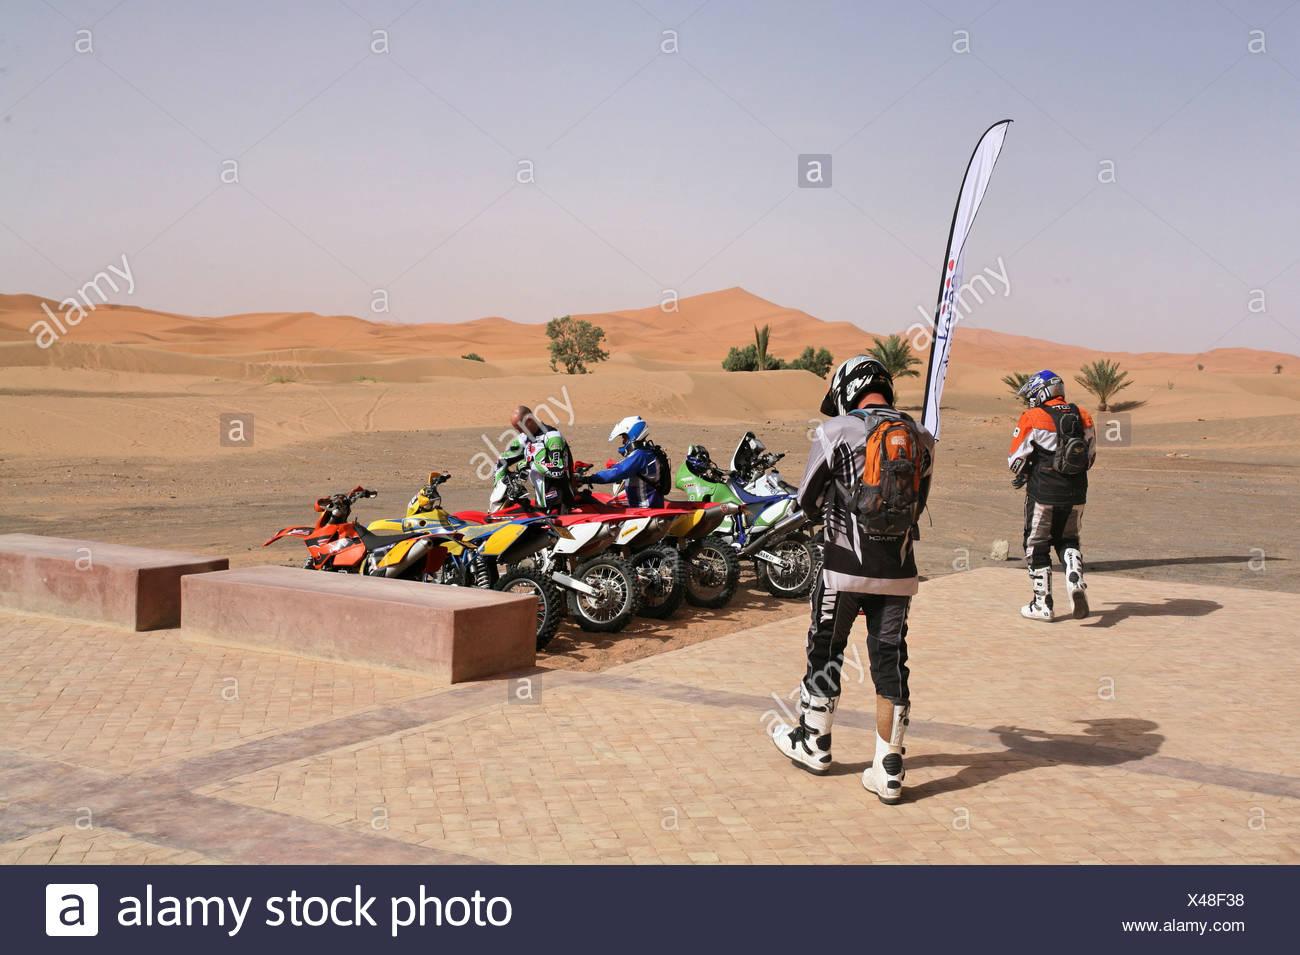 motor sport moto cross Enduro adventure Motrrad motorcycles motorbikes desert Sahara Merzouga Morocco Africa - Stock Image